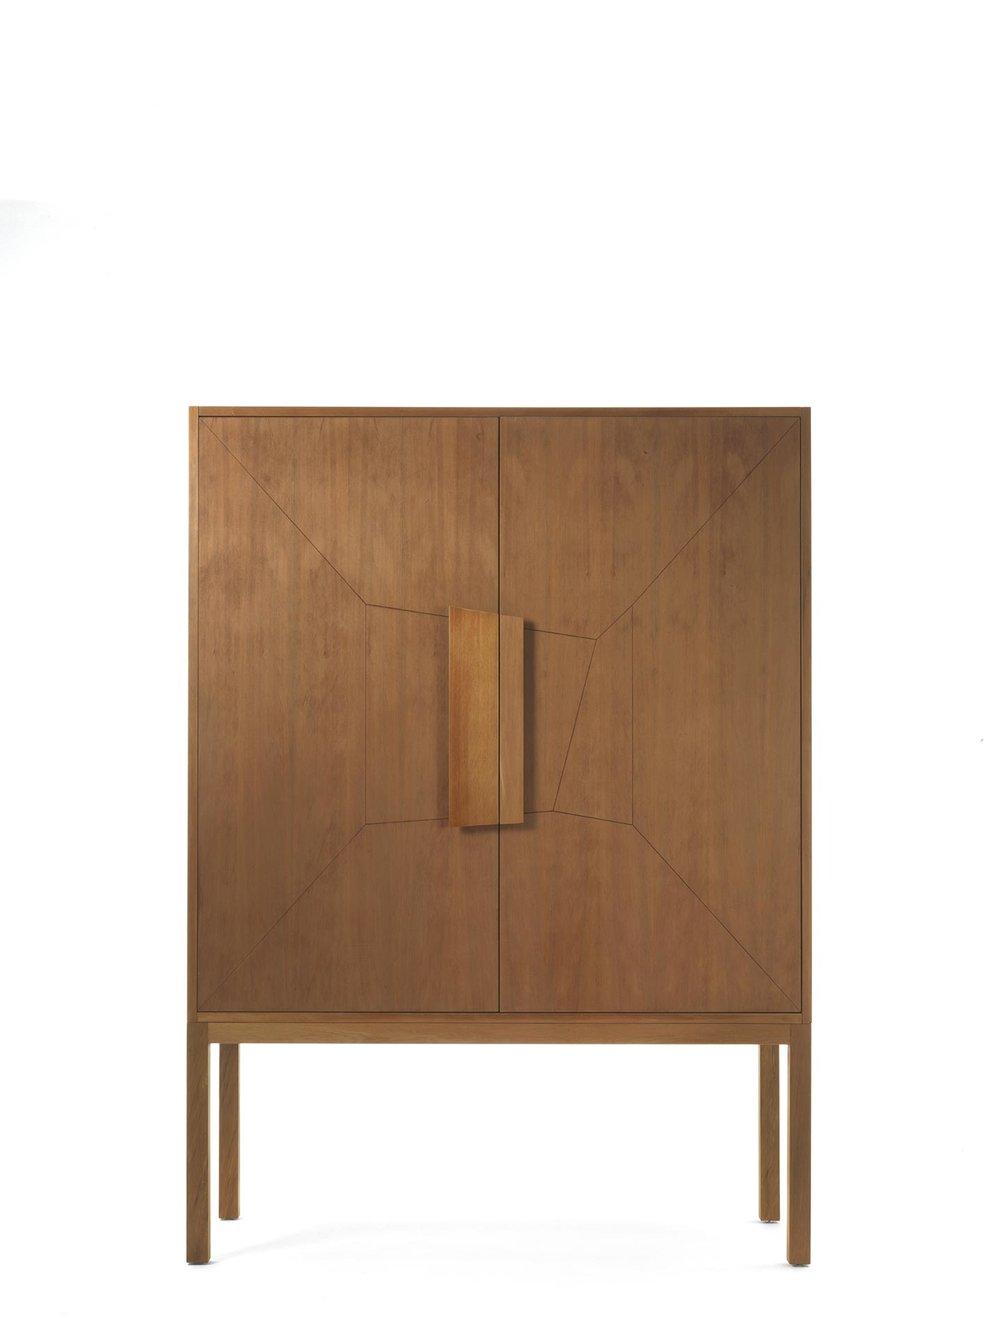 dekauri-vanity-riva-1920-daniel-germani-designs-1.jpg